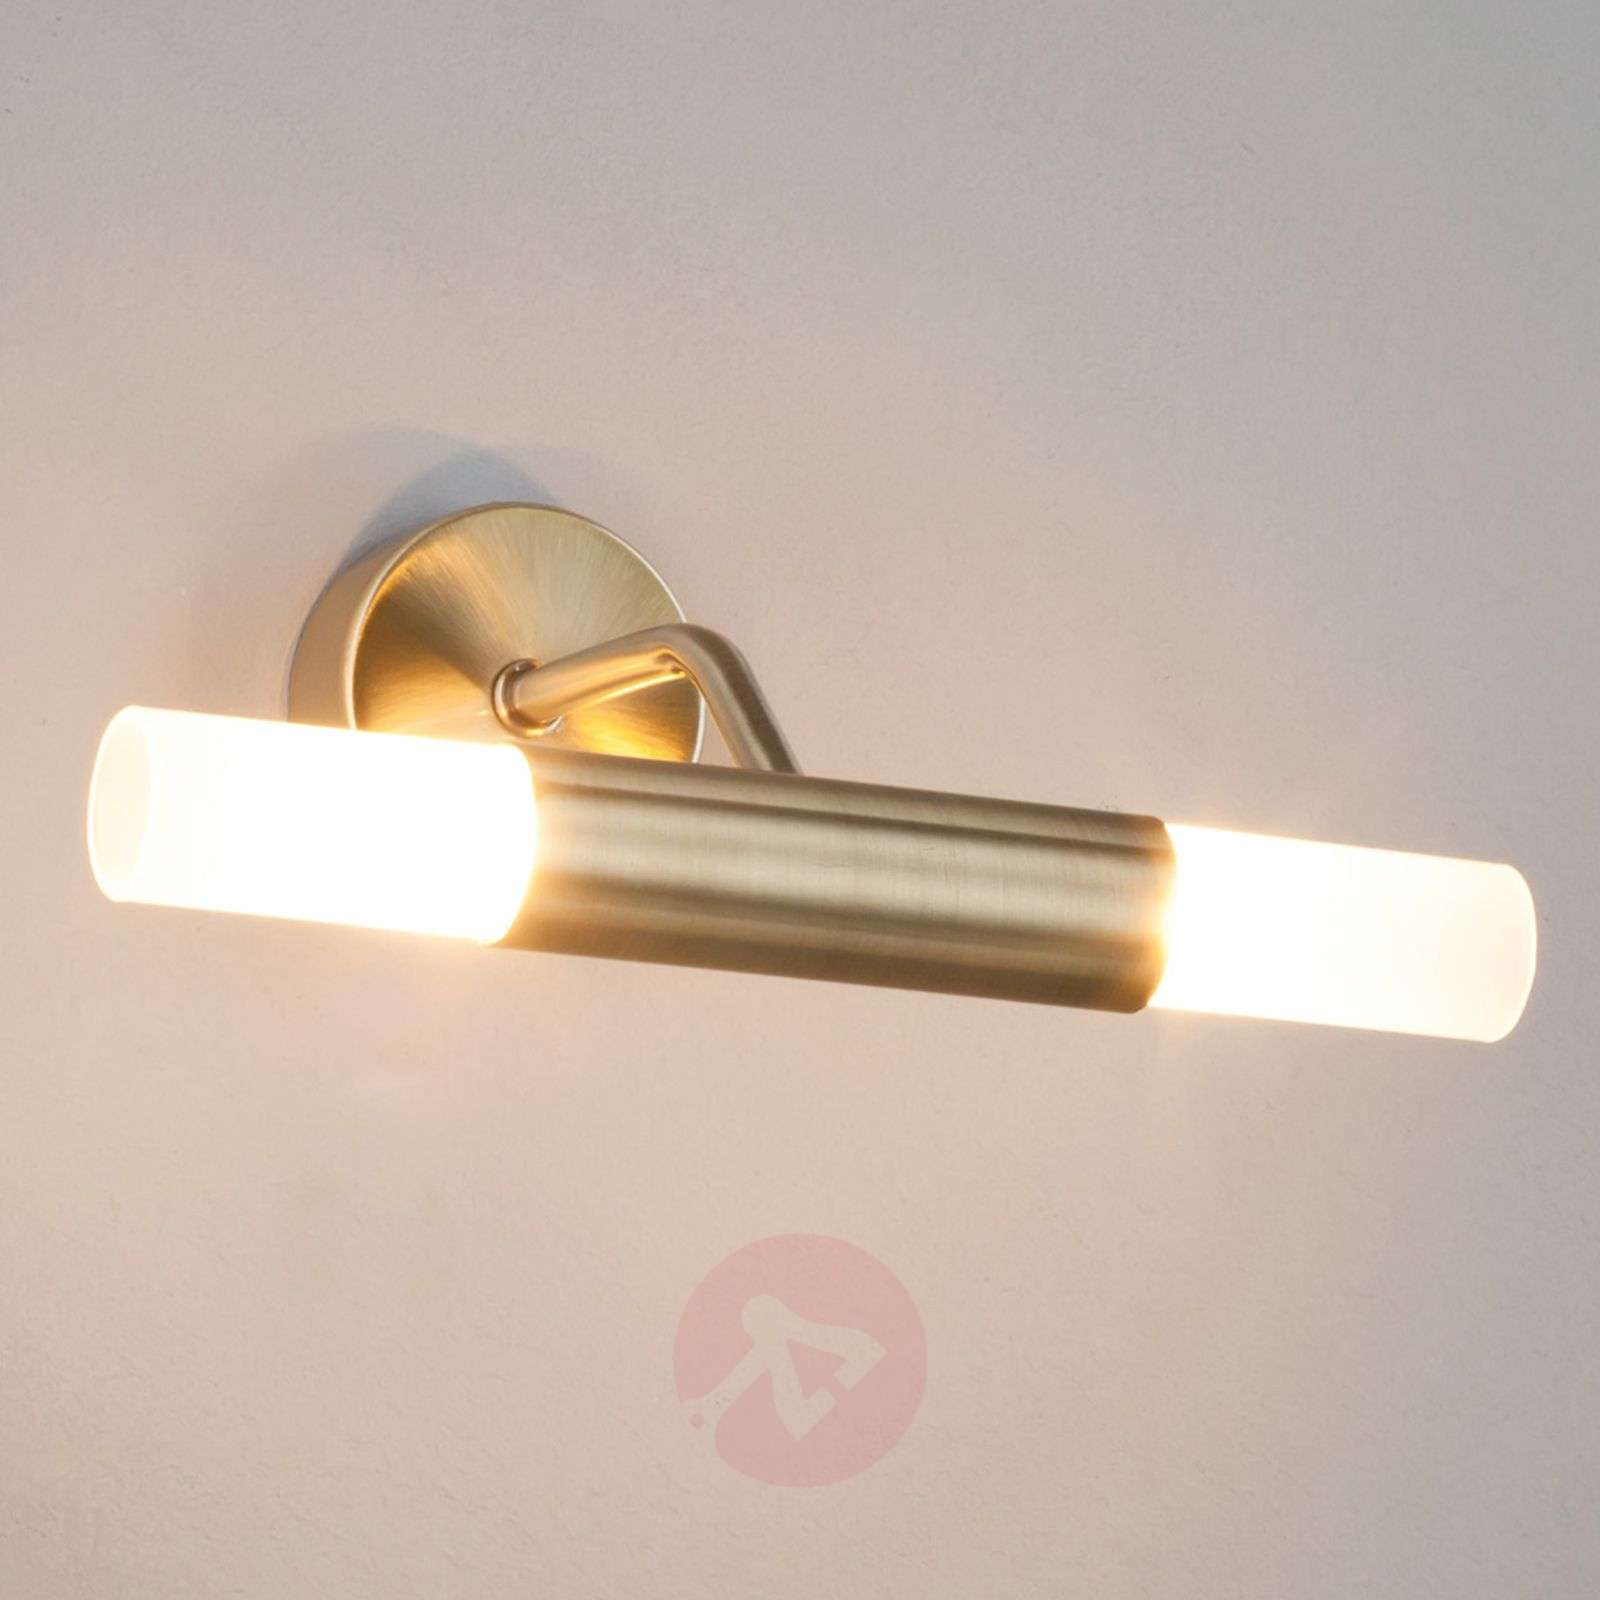 Antique brass-coloured wall lamp Viviane-9970024-01